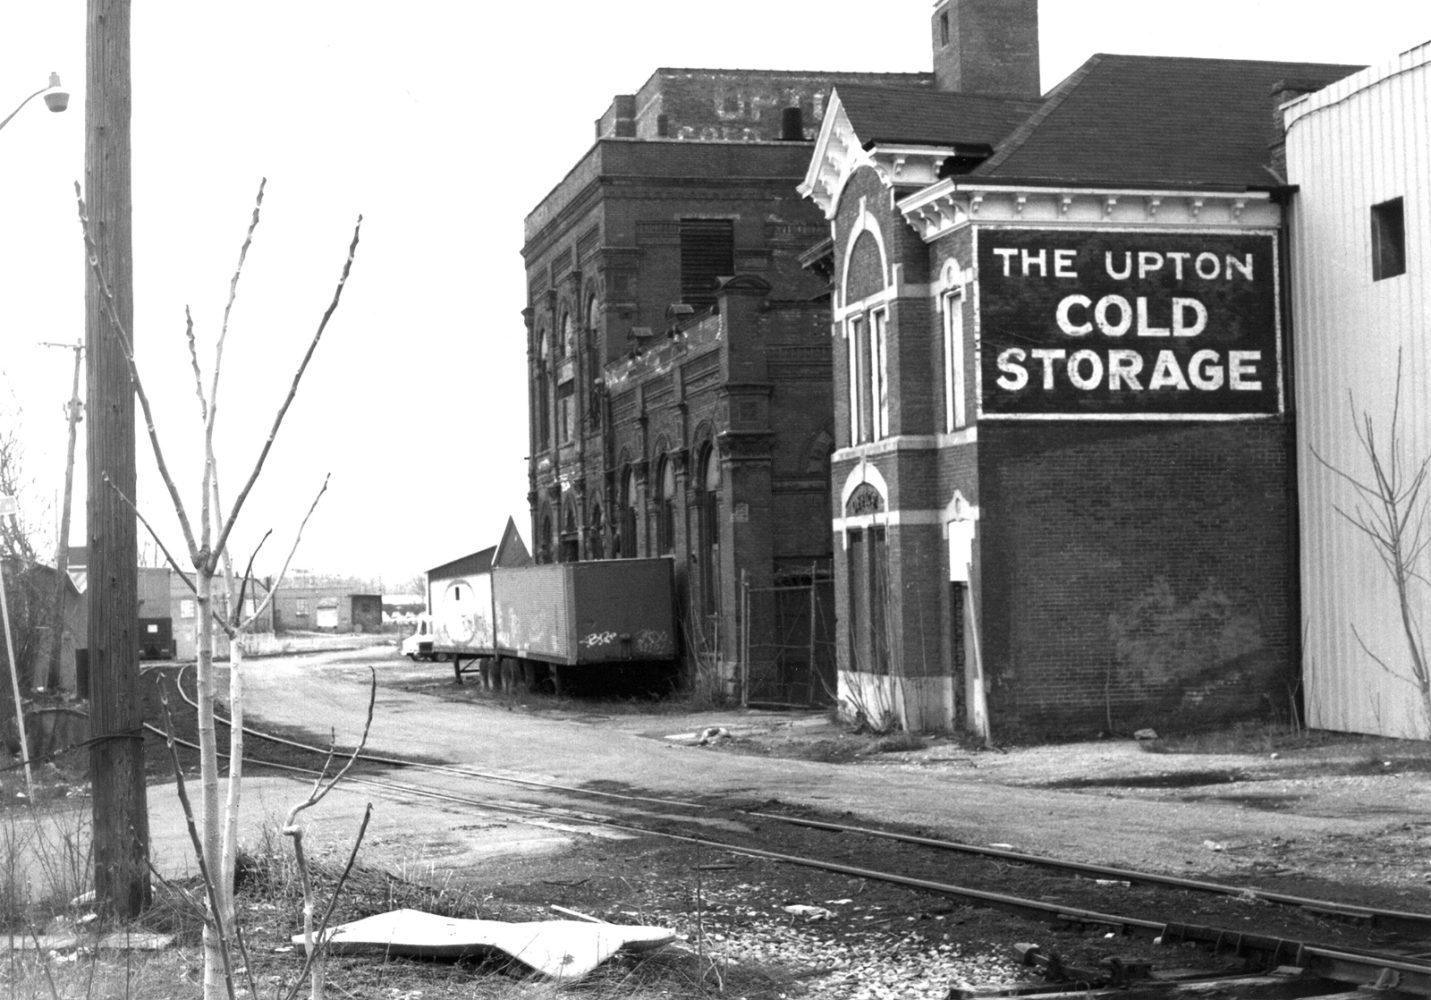 Upton Cold Storage 38 Cliff Street - Paul Dodd photo 1976